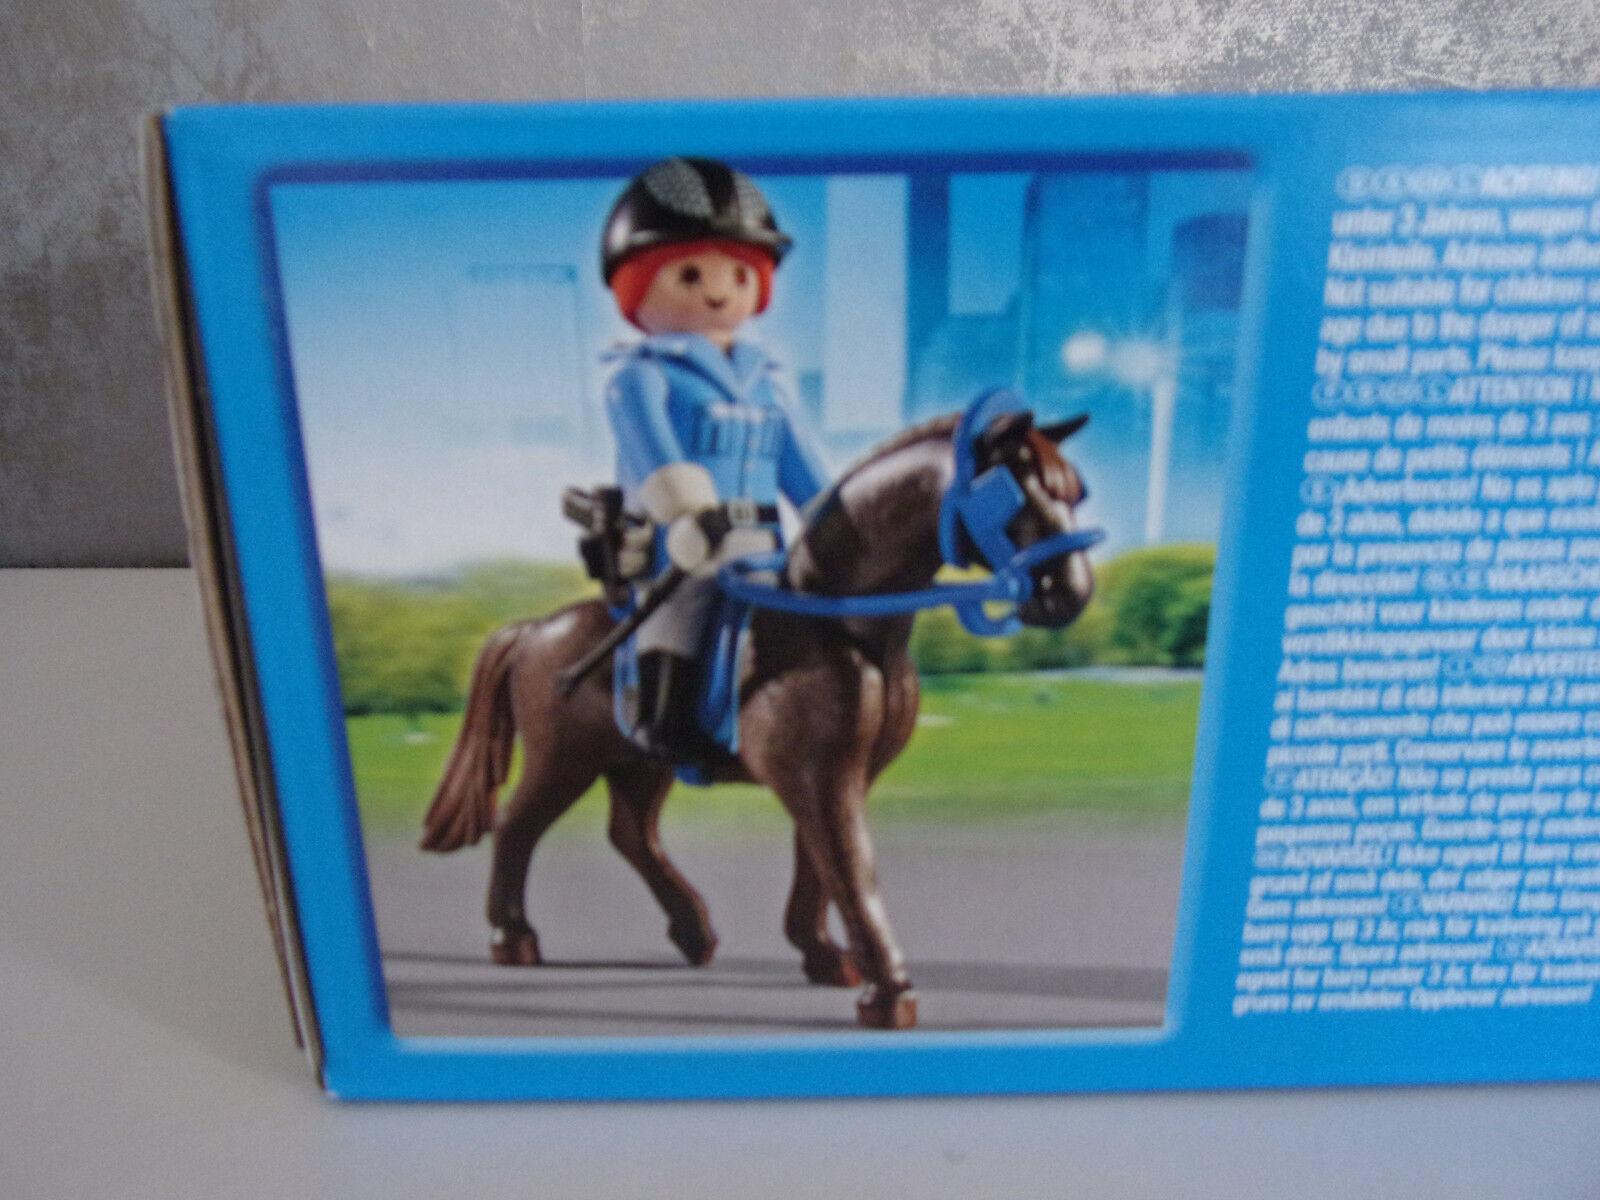 Neu /& OVP Playmobil City Action 6875 Berittene Polizei mit Anhänger